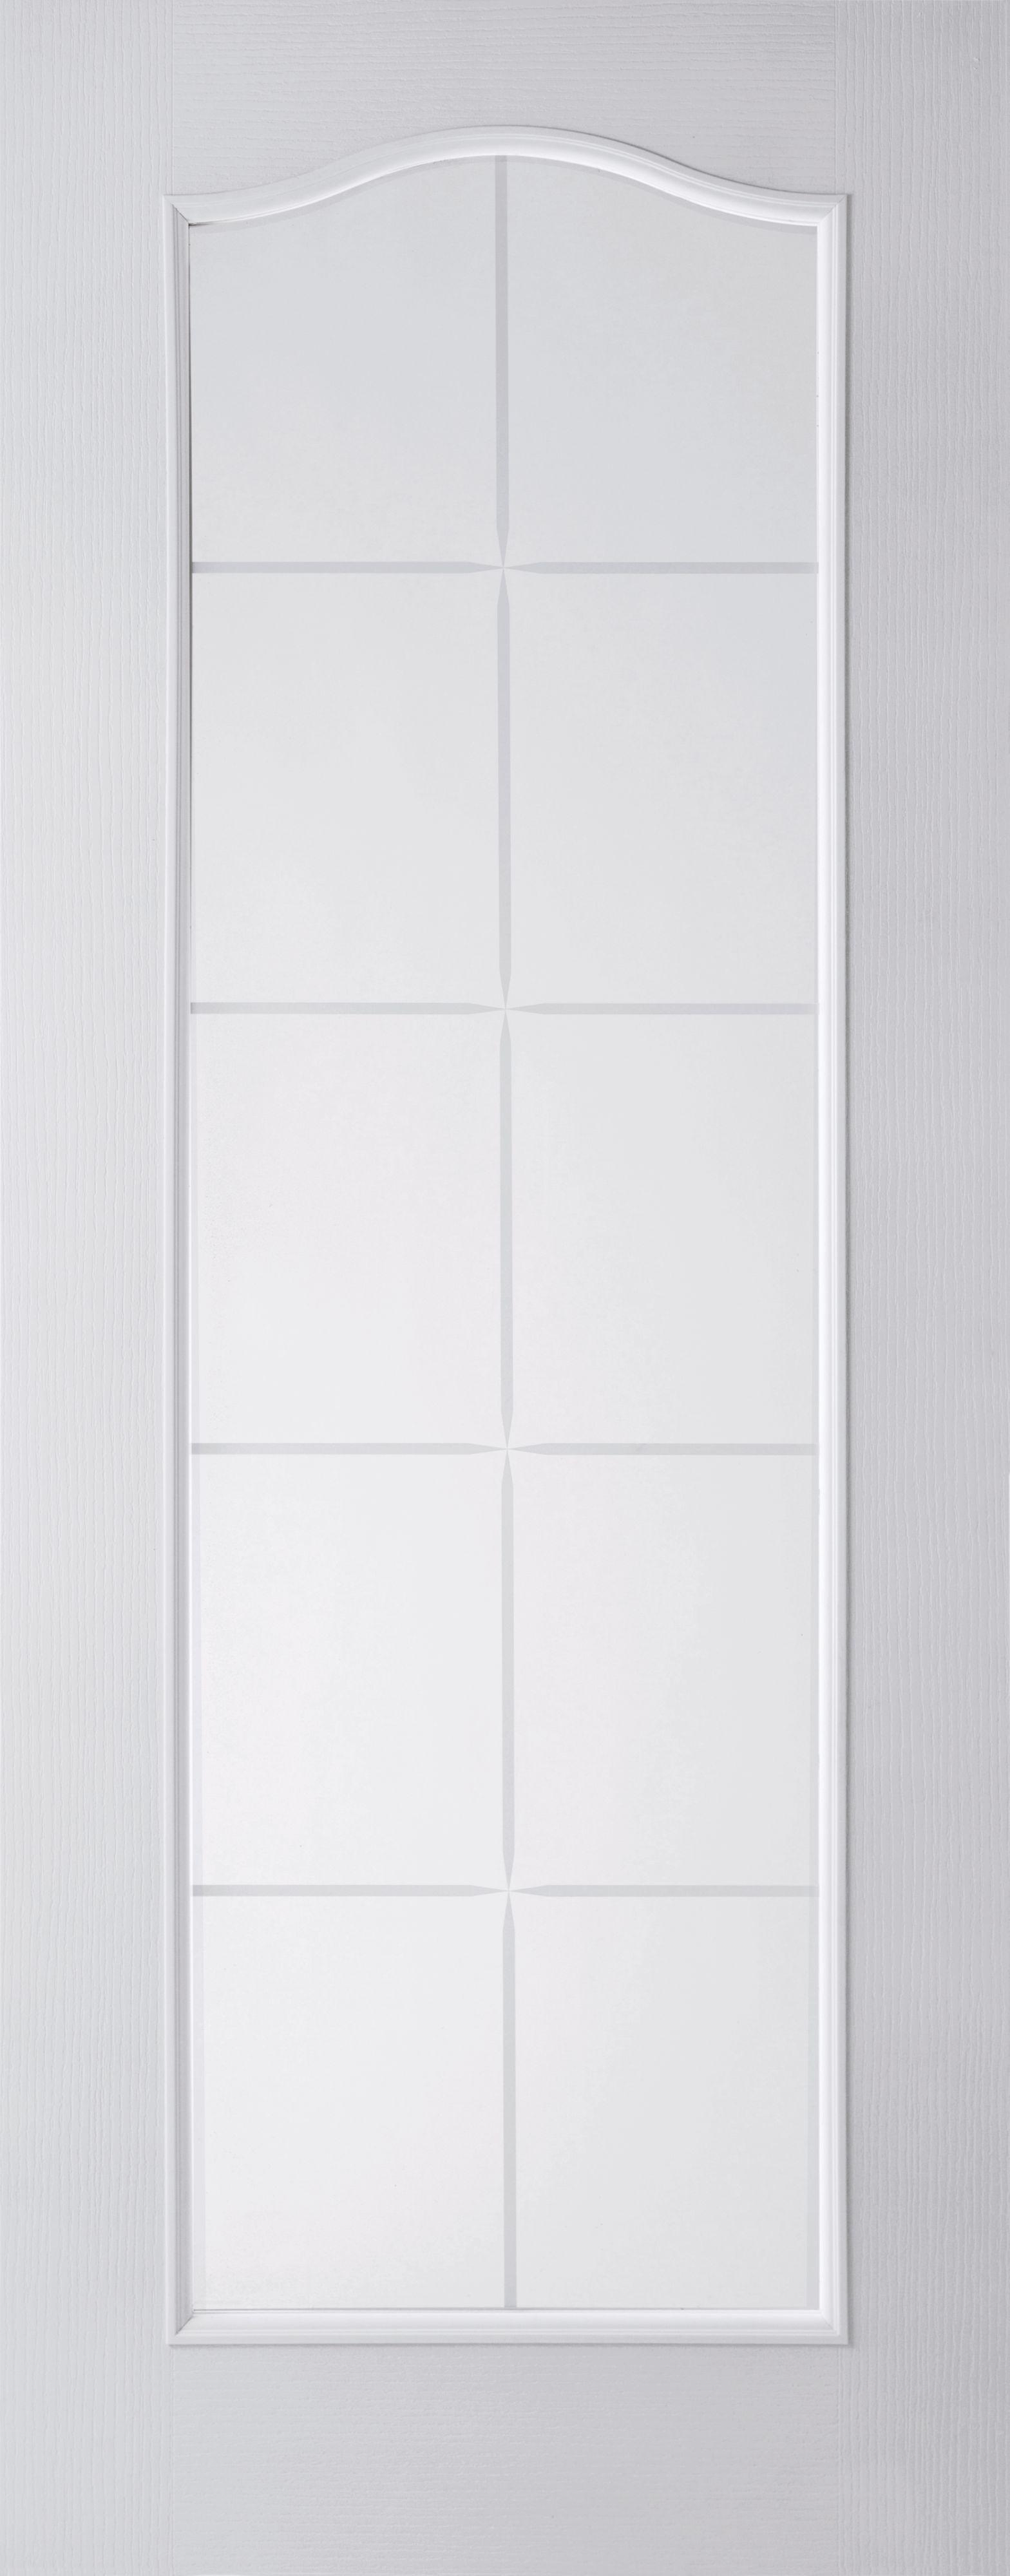 10 Lite Woodgrain Effect White Internal Glazed Door, (h)2040mm (w)826mm